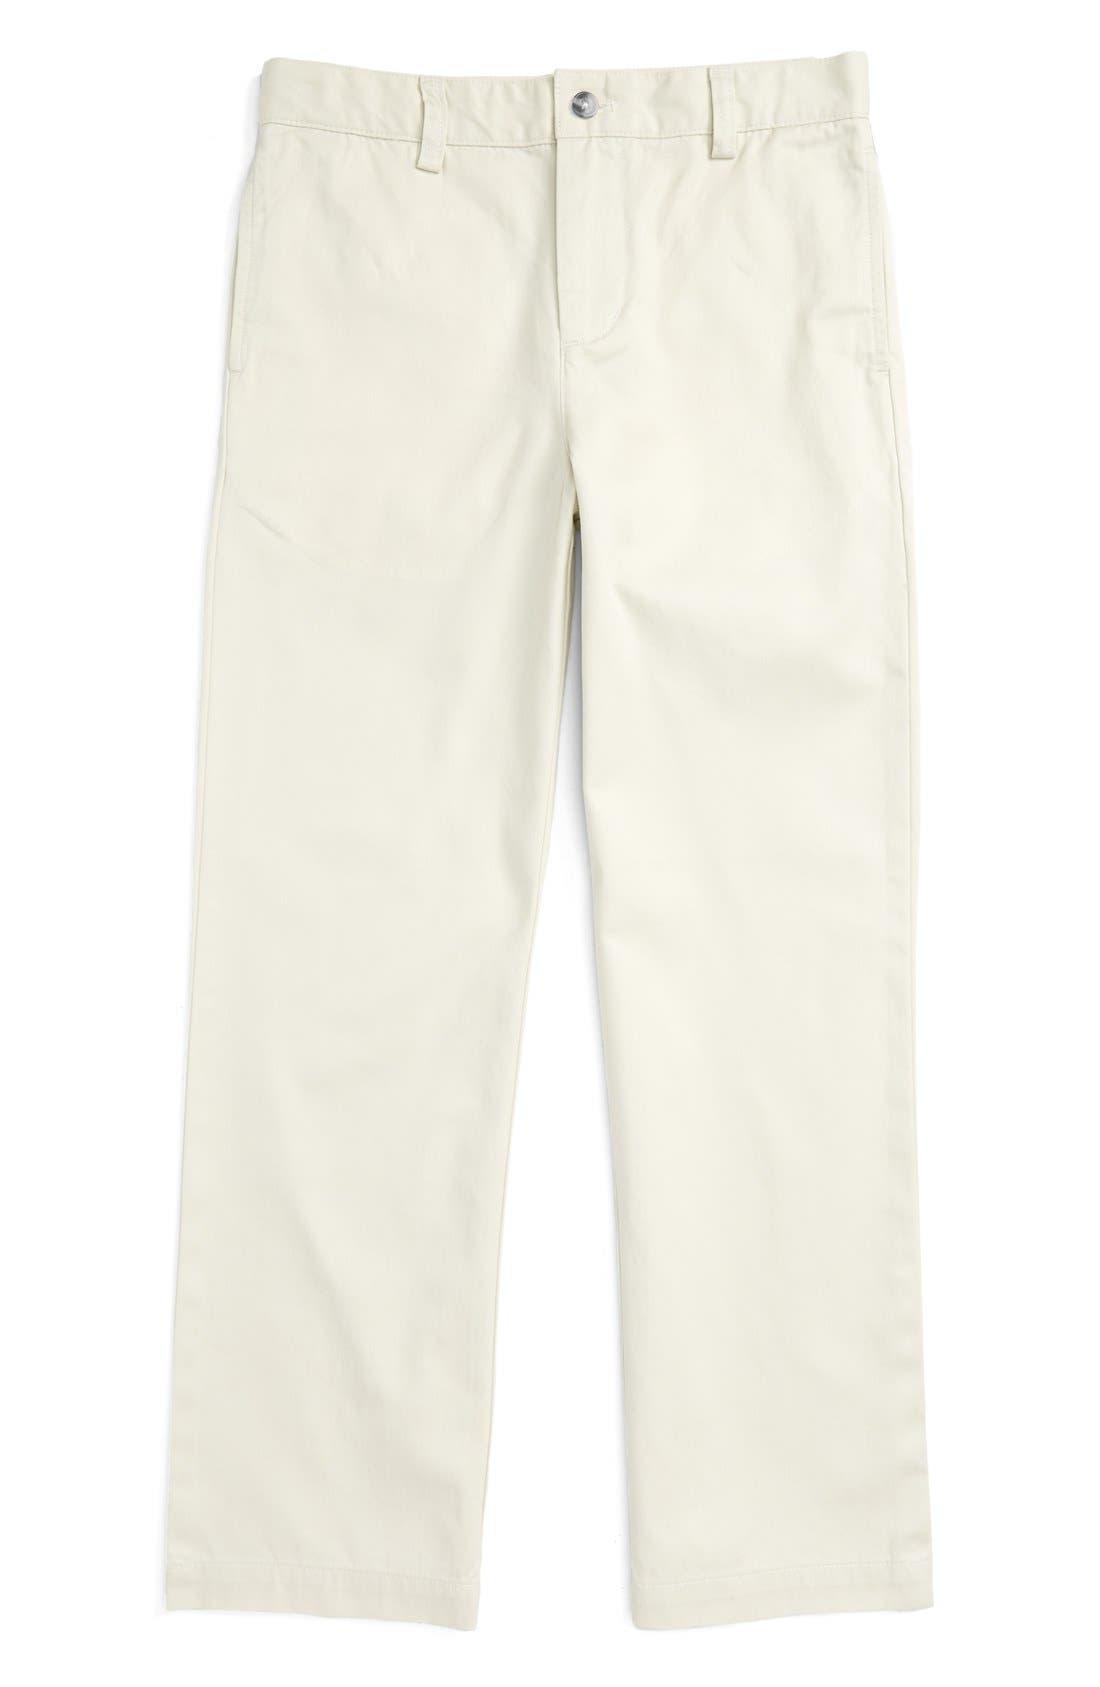 Main Image - vineyard vines Club Cotton Twill Pants (Big Boys)